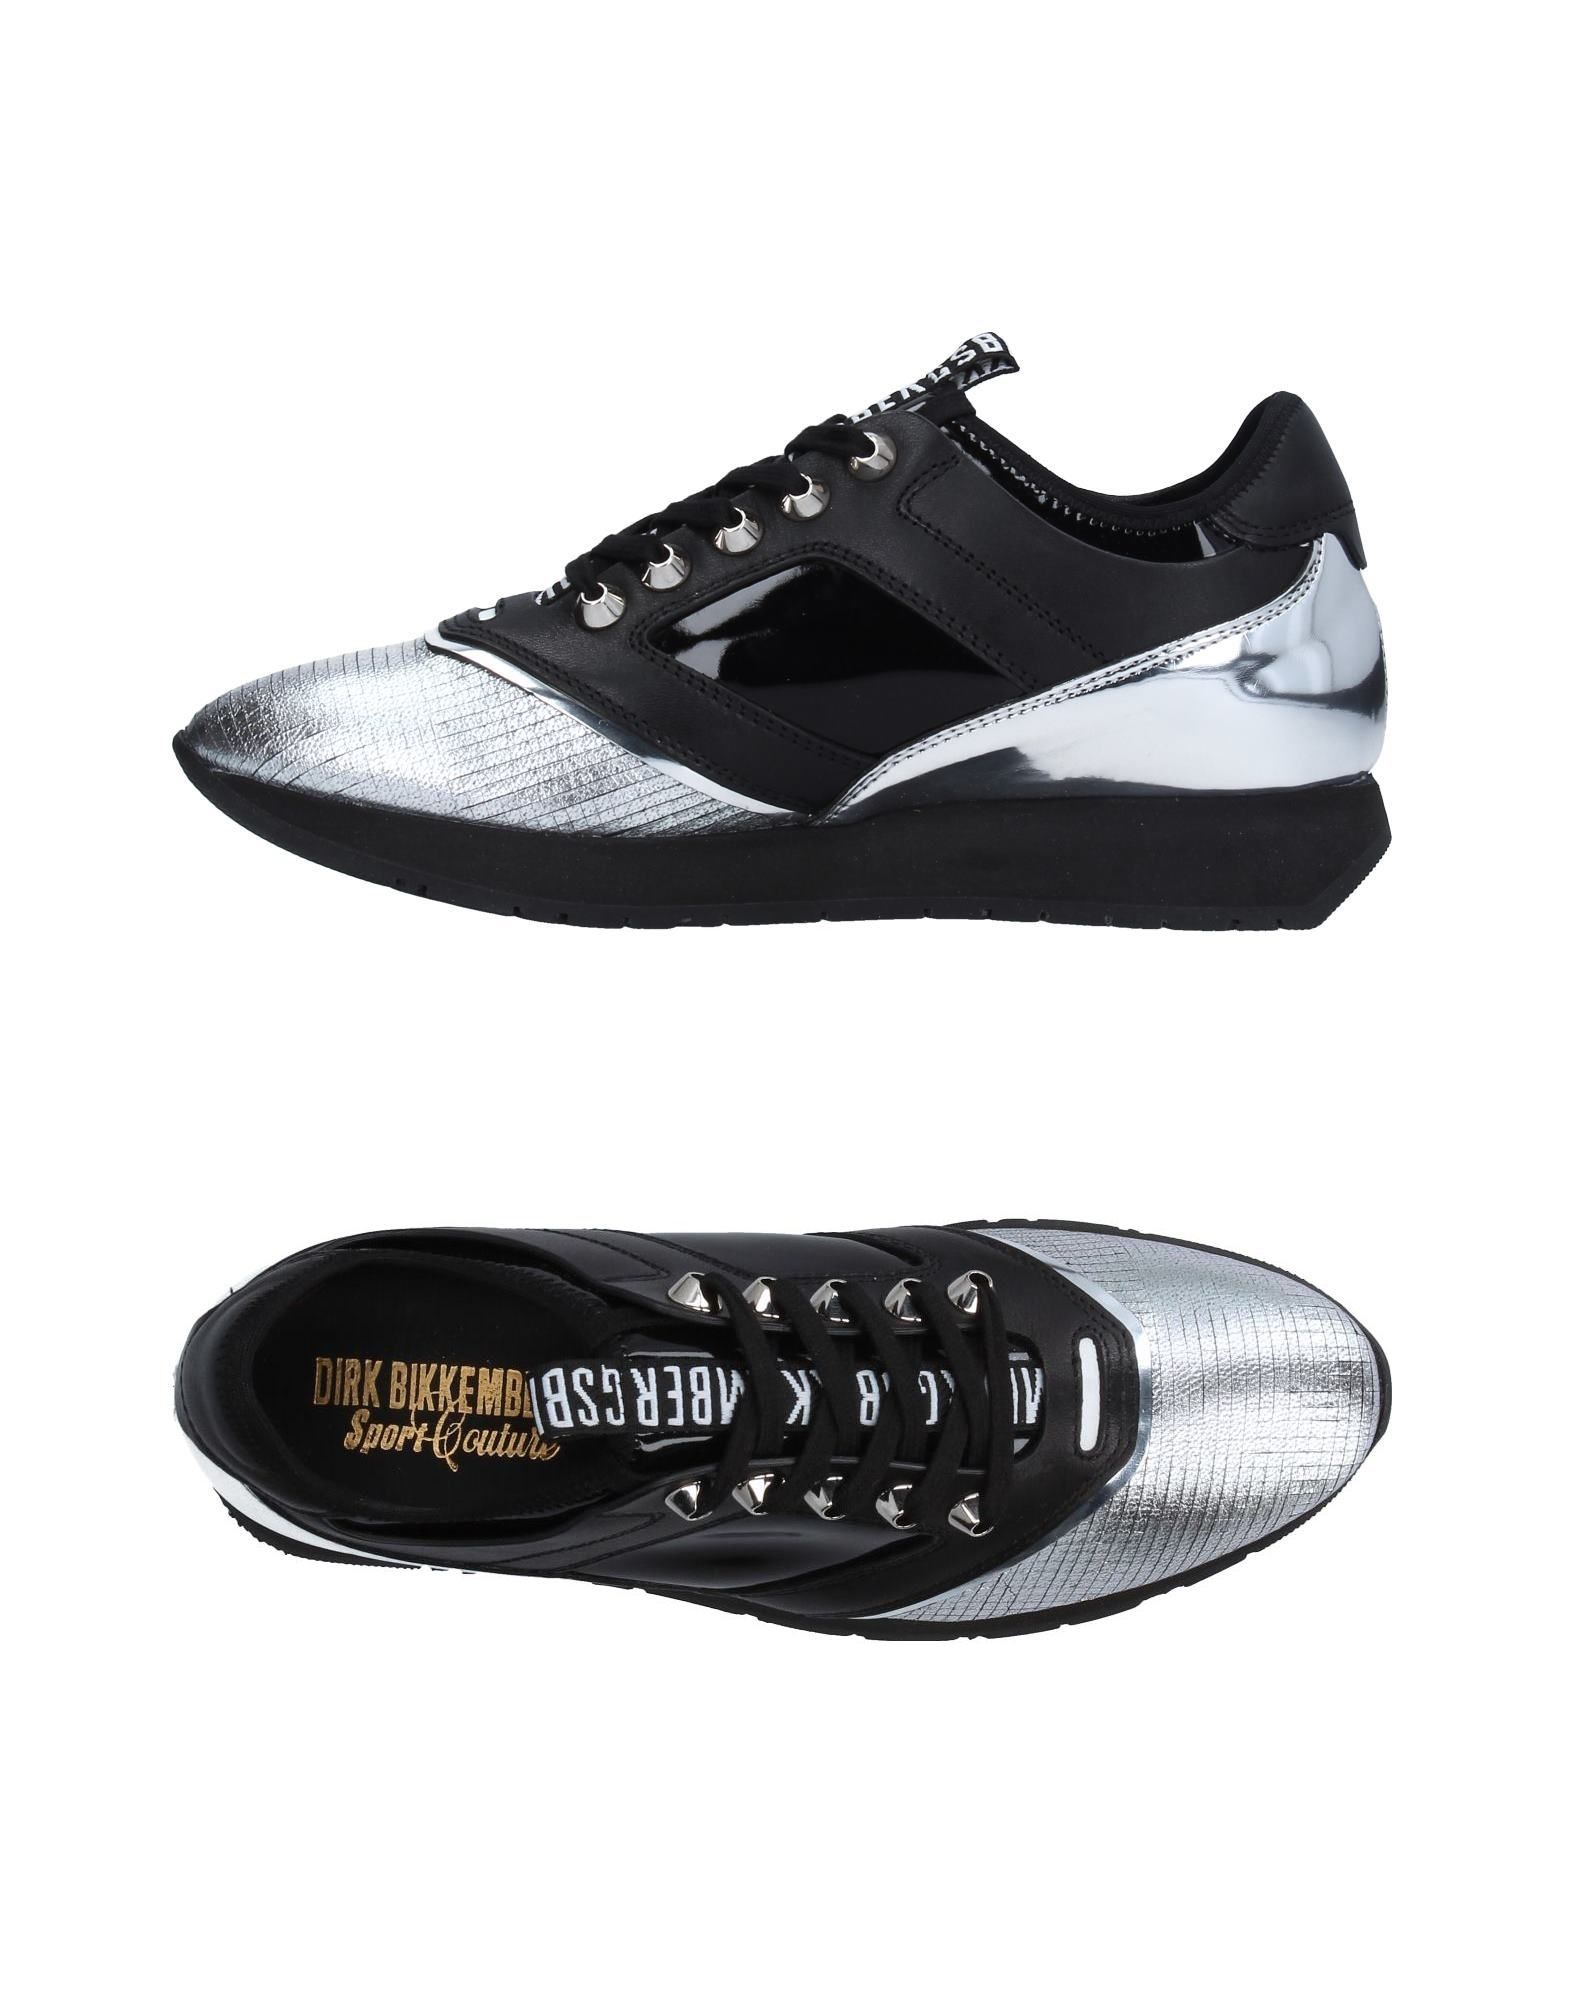 DIRK BIKKEMBERGS SPORT COUTURE Низкие кеды и кроссовки dirk bikkembergs sport couture пиджак